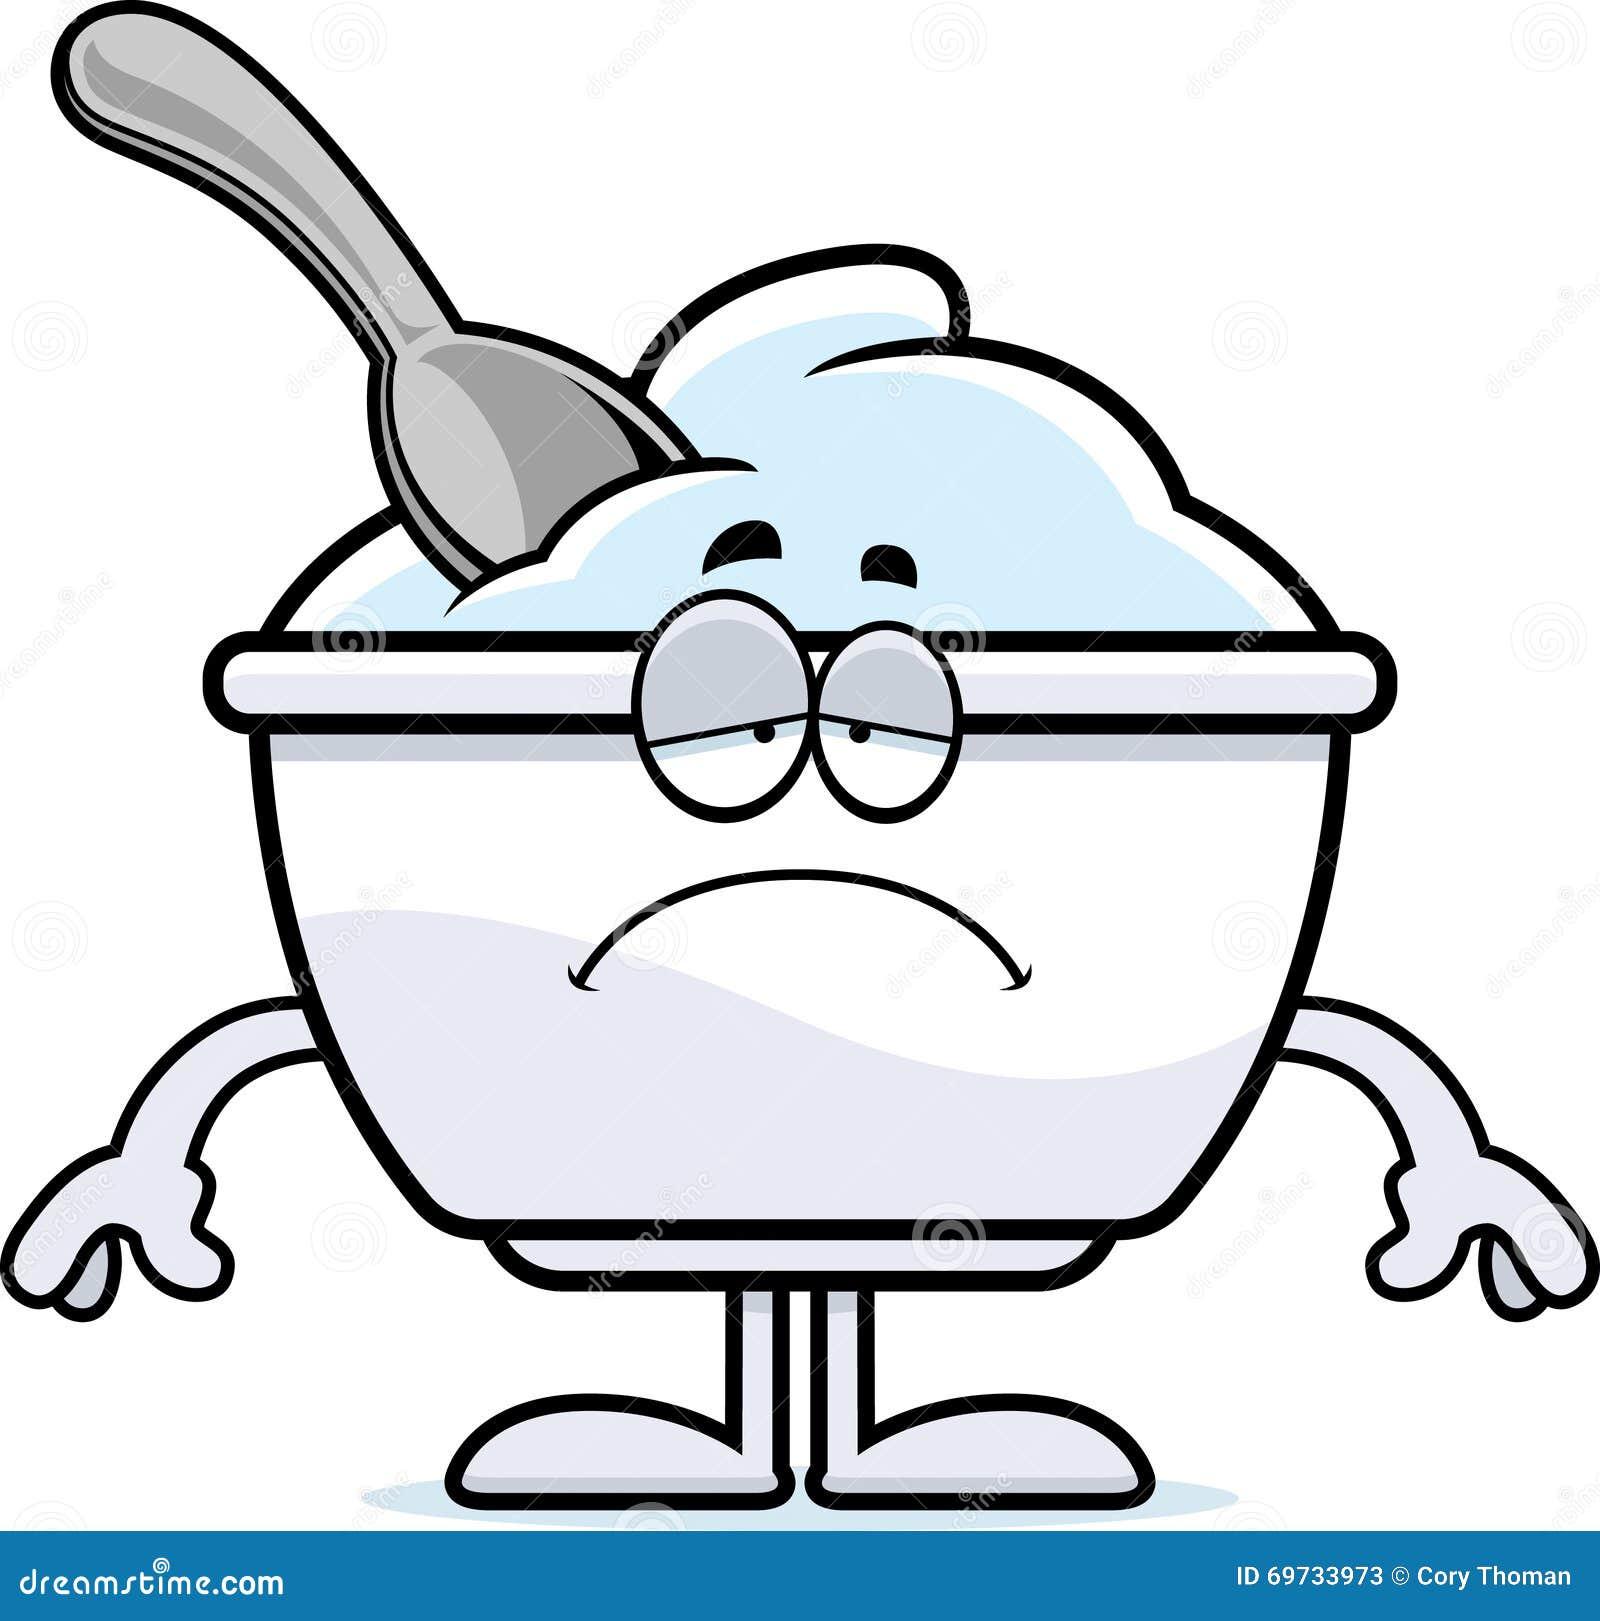 Yogurt Cartoon | www.imgkid.com - The Image Kid Has It!